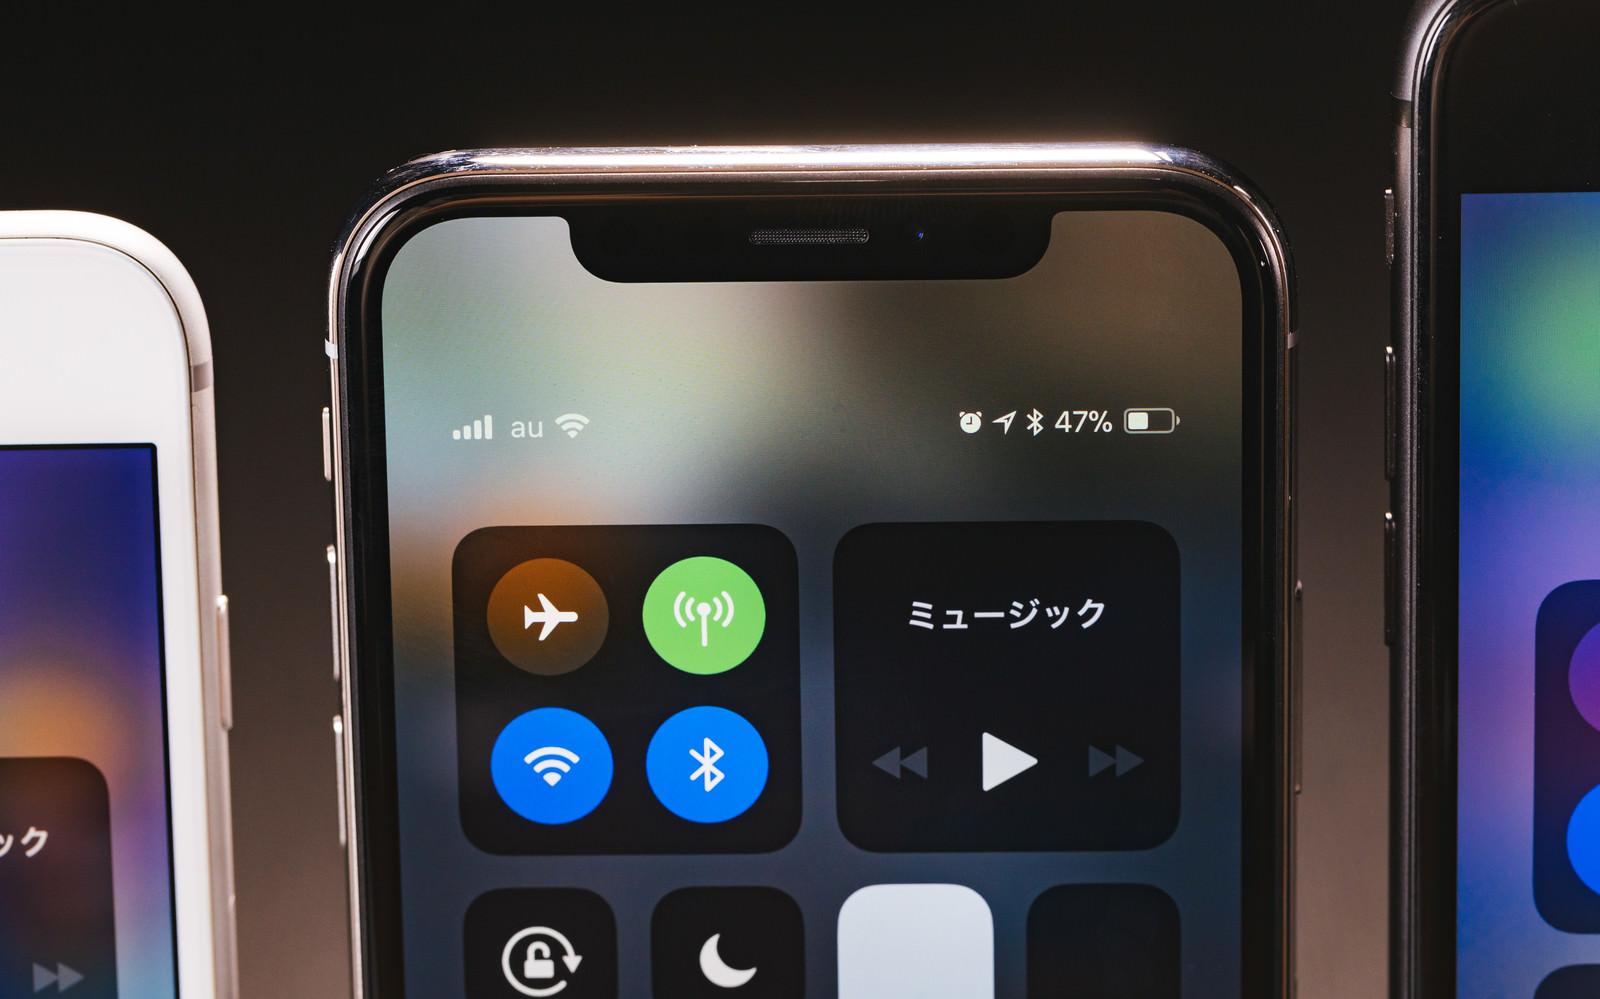 「iPhone X 端末上部のセンサー類」の写真